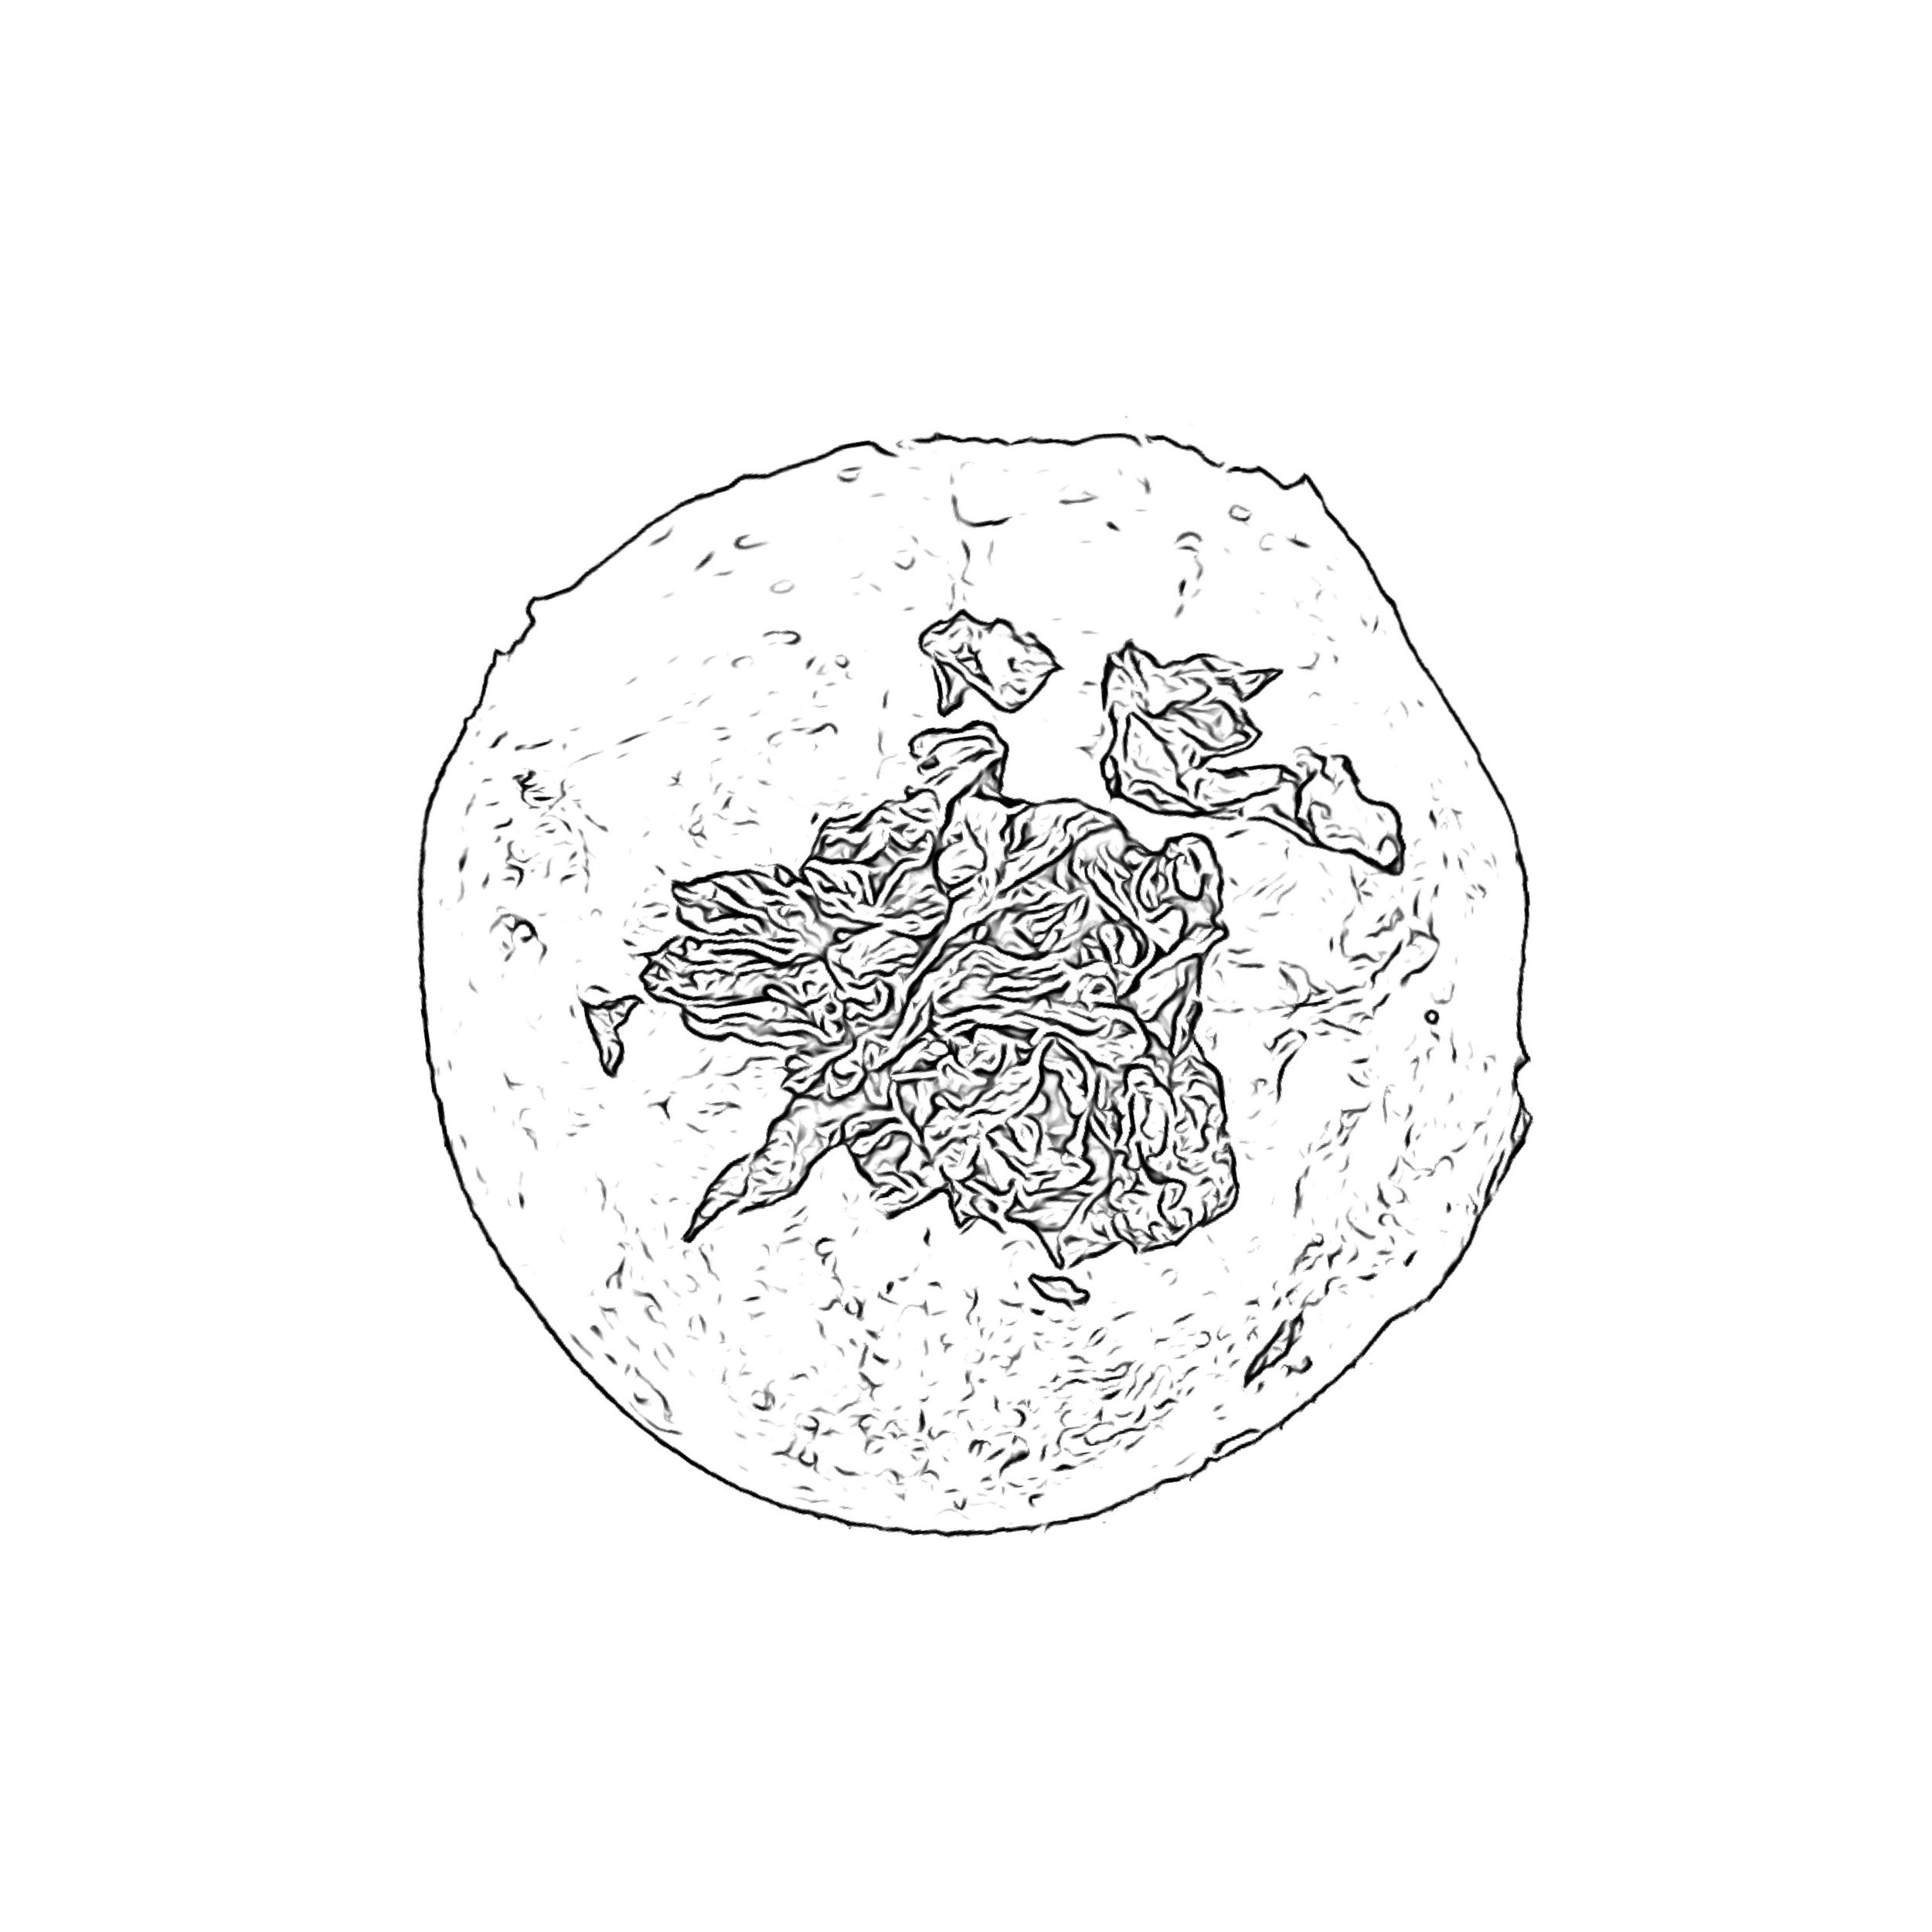 Rella Sketch 2.JPG